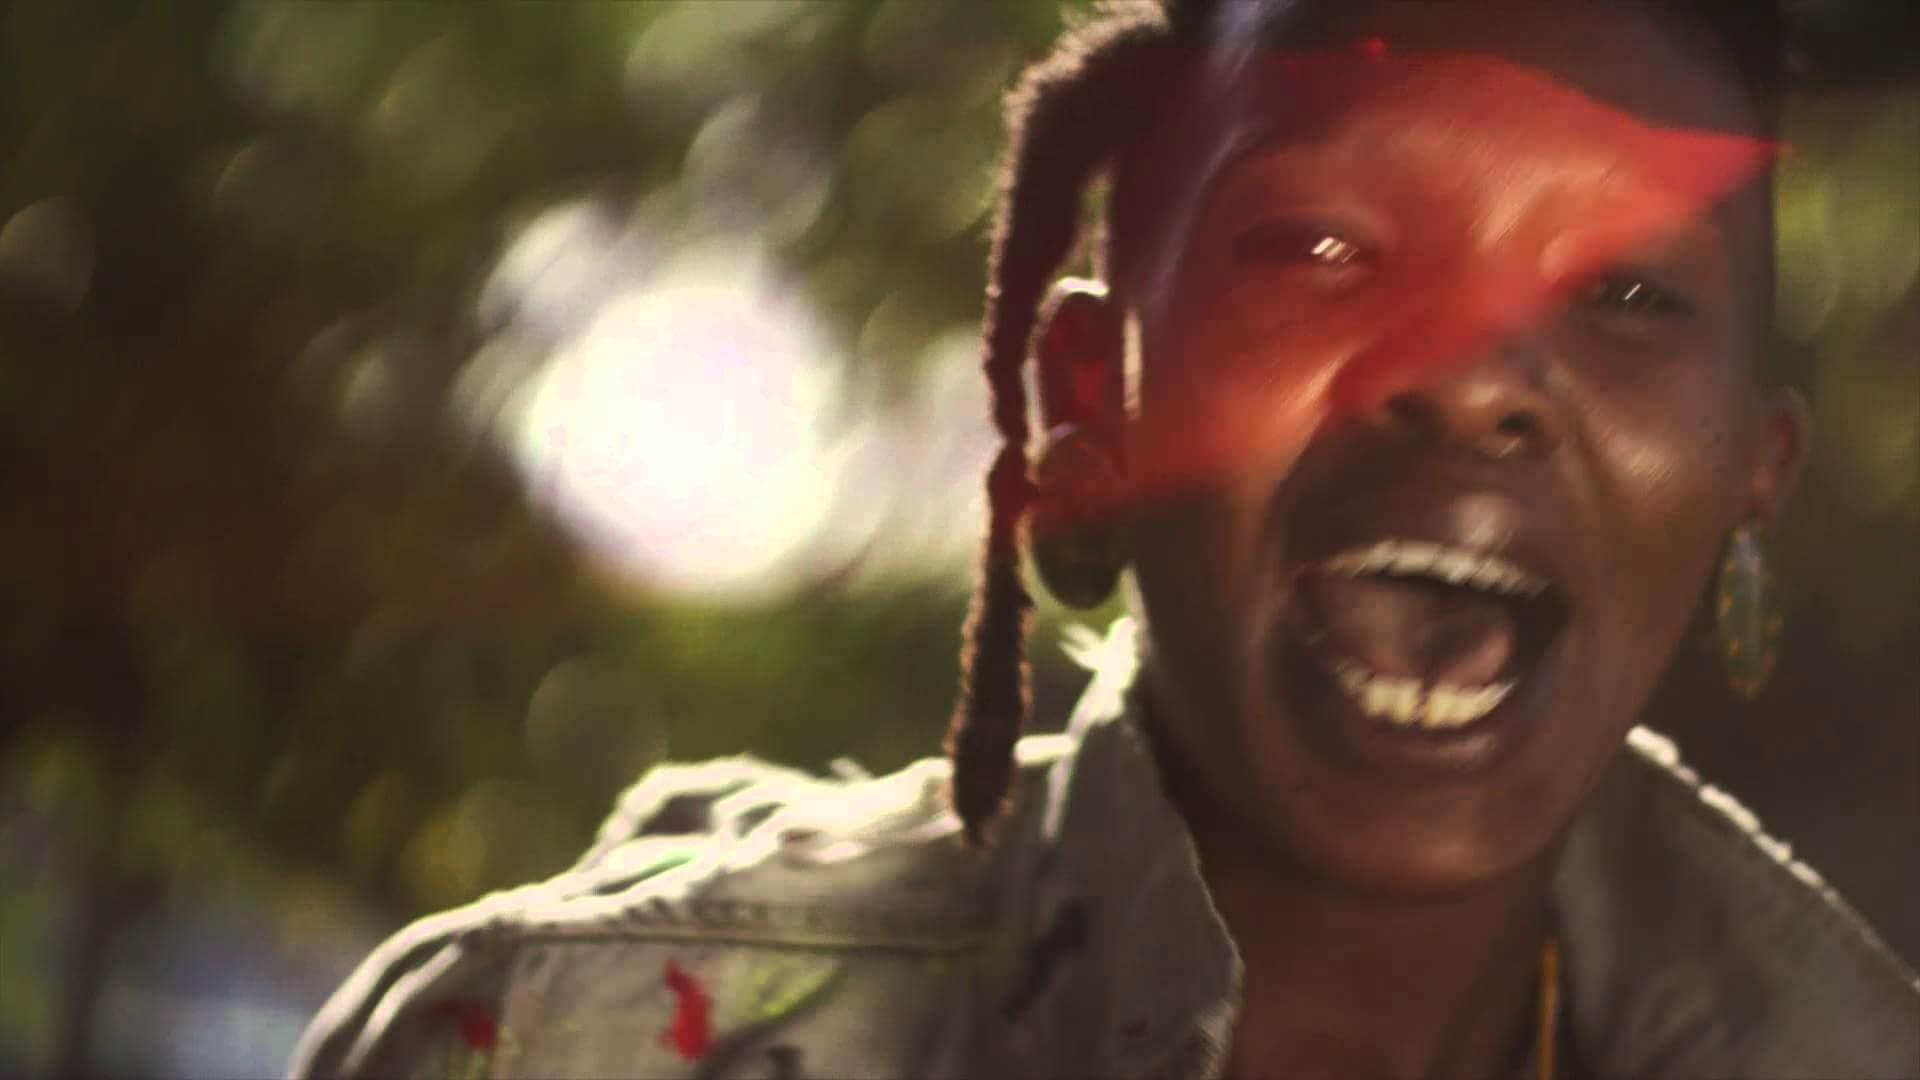 Oh Jah – Jazz P c/ Ras Skunk